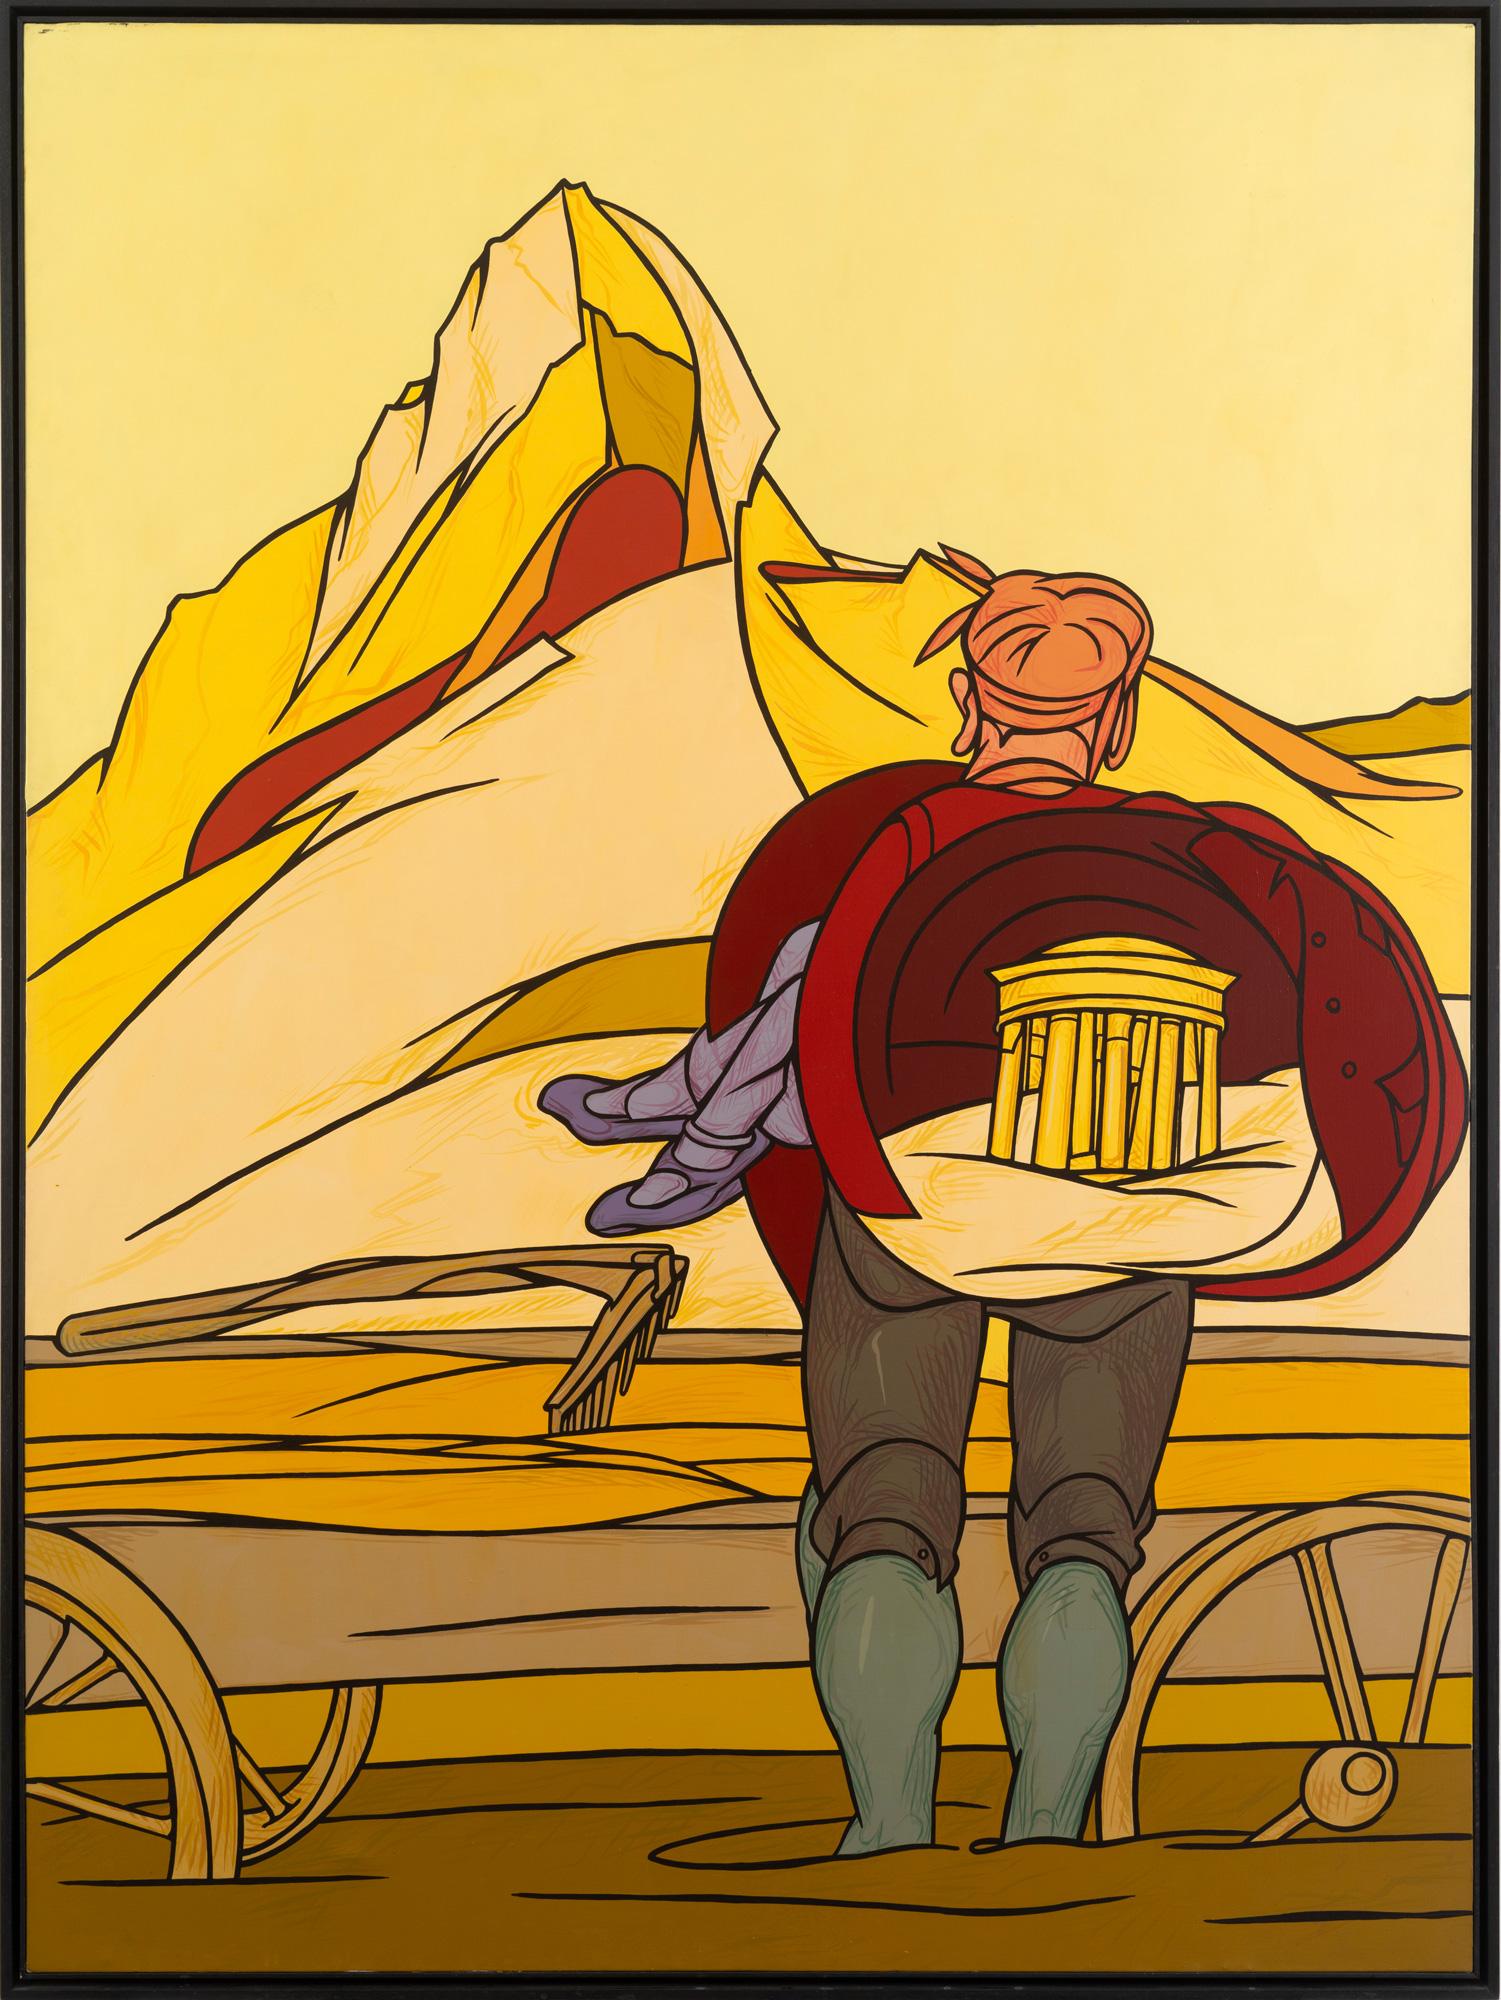 Valerio Adami à la galerie Templon : L'Ascension, 1984